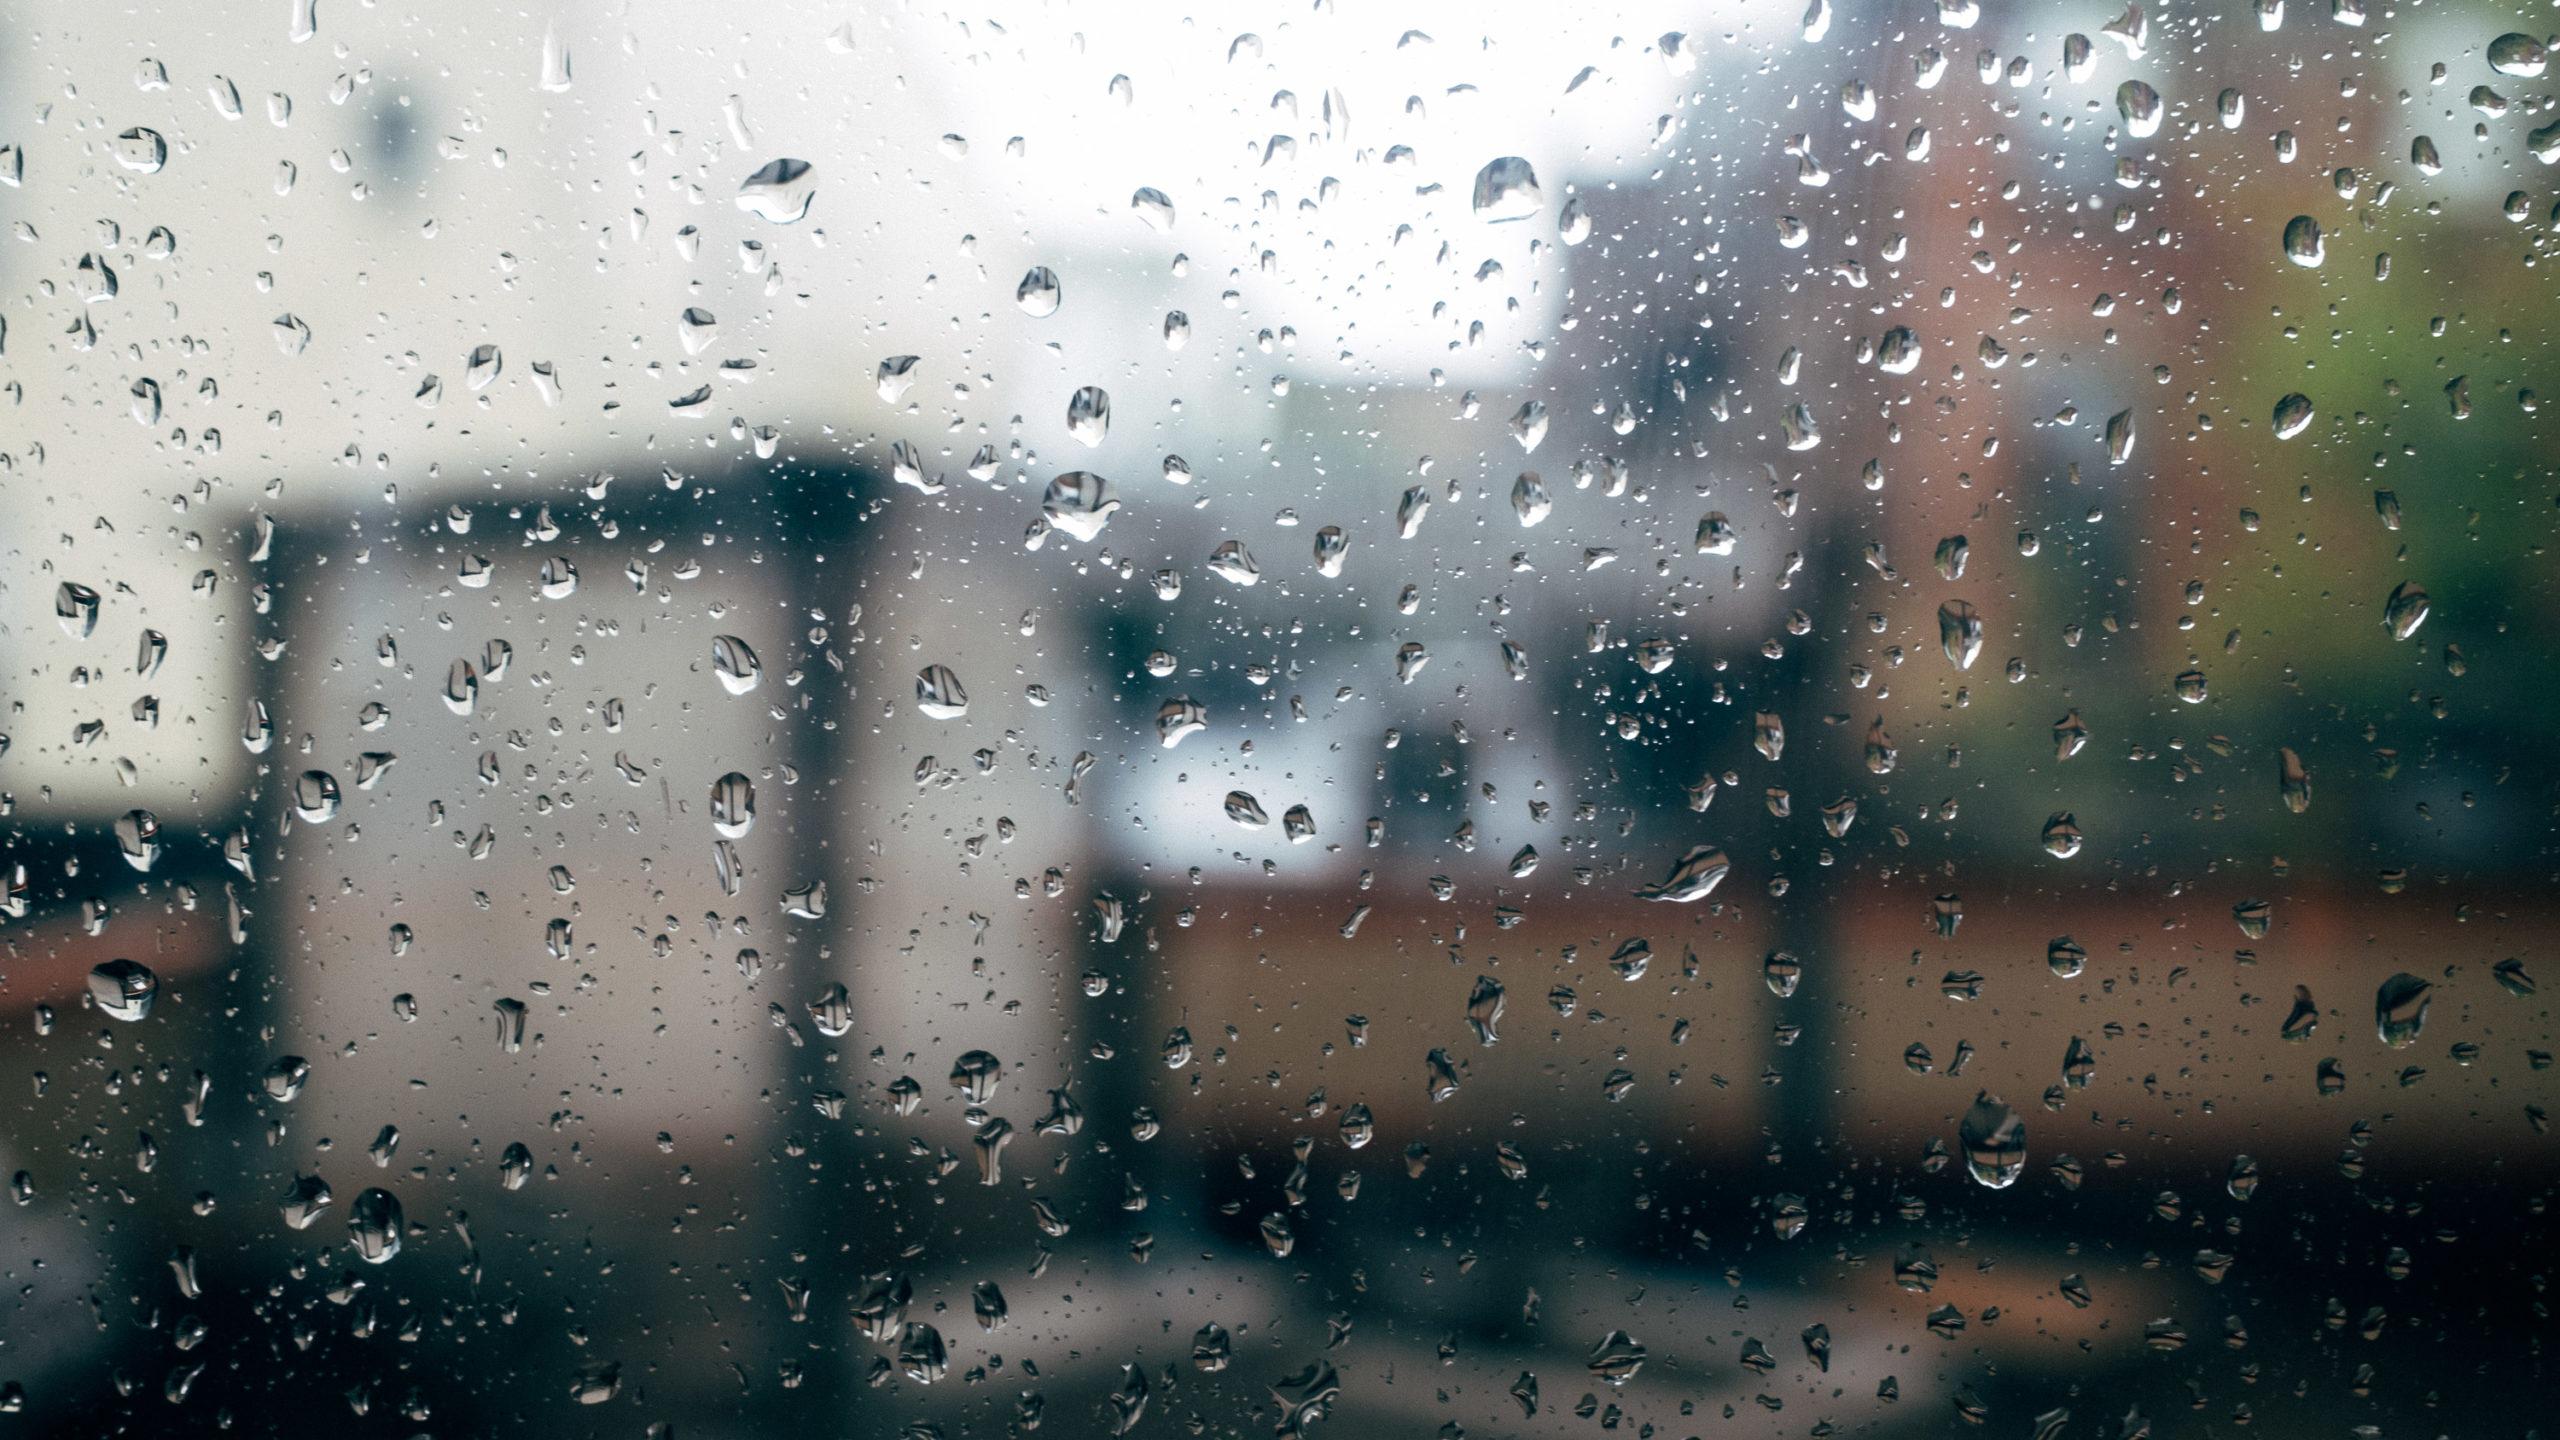 rain on pane of glass